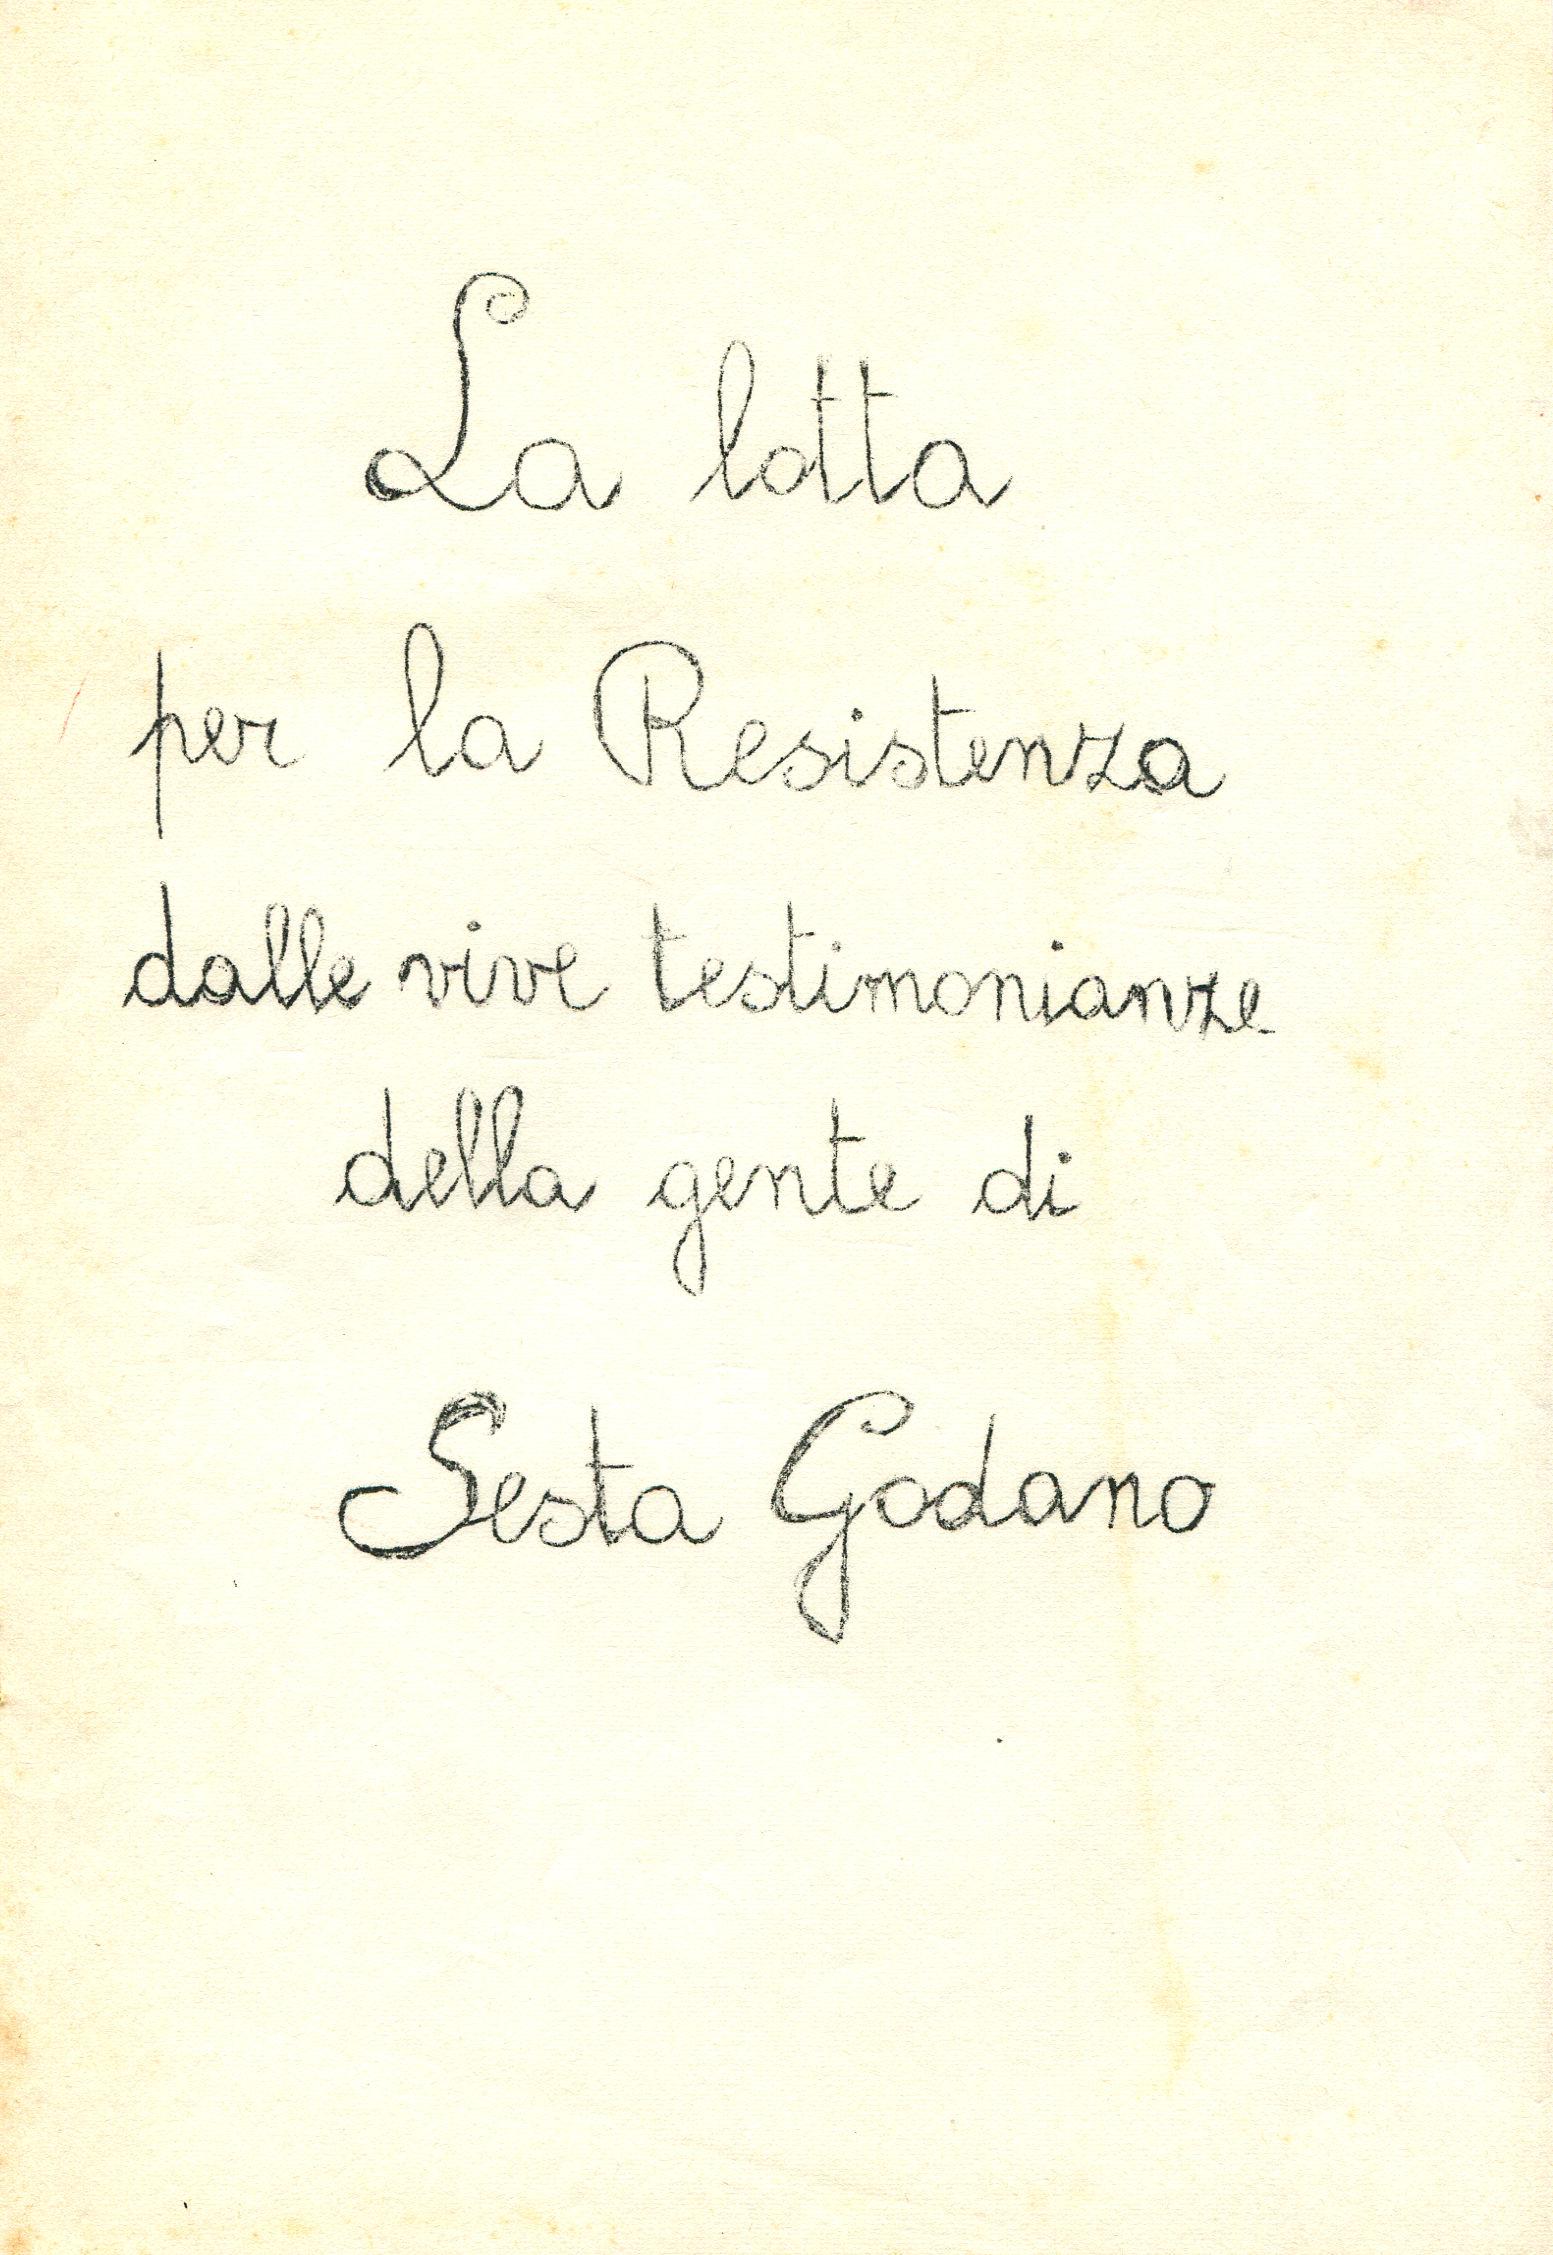 Scuola Sesta Godano